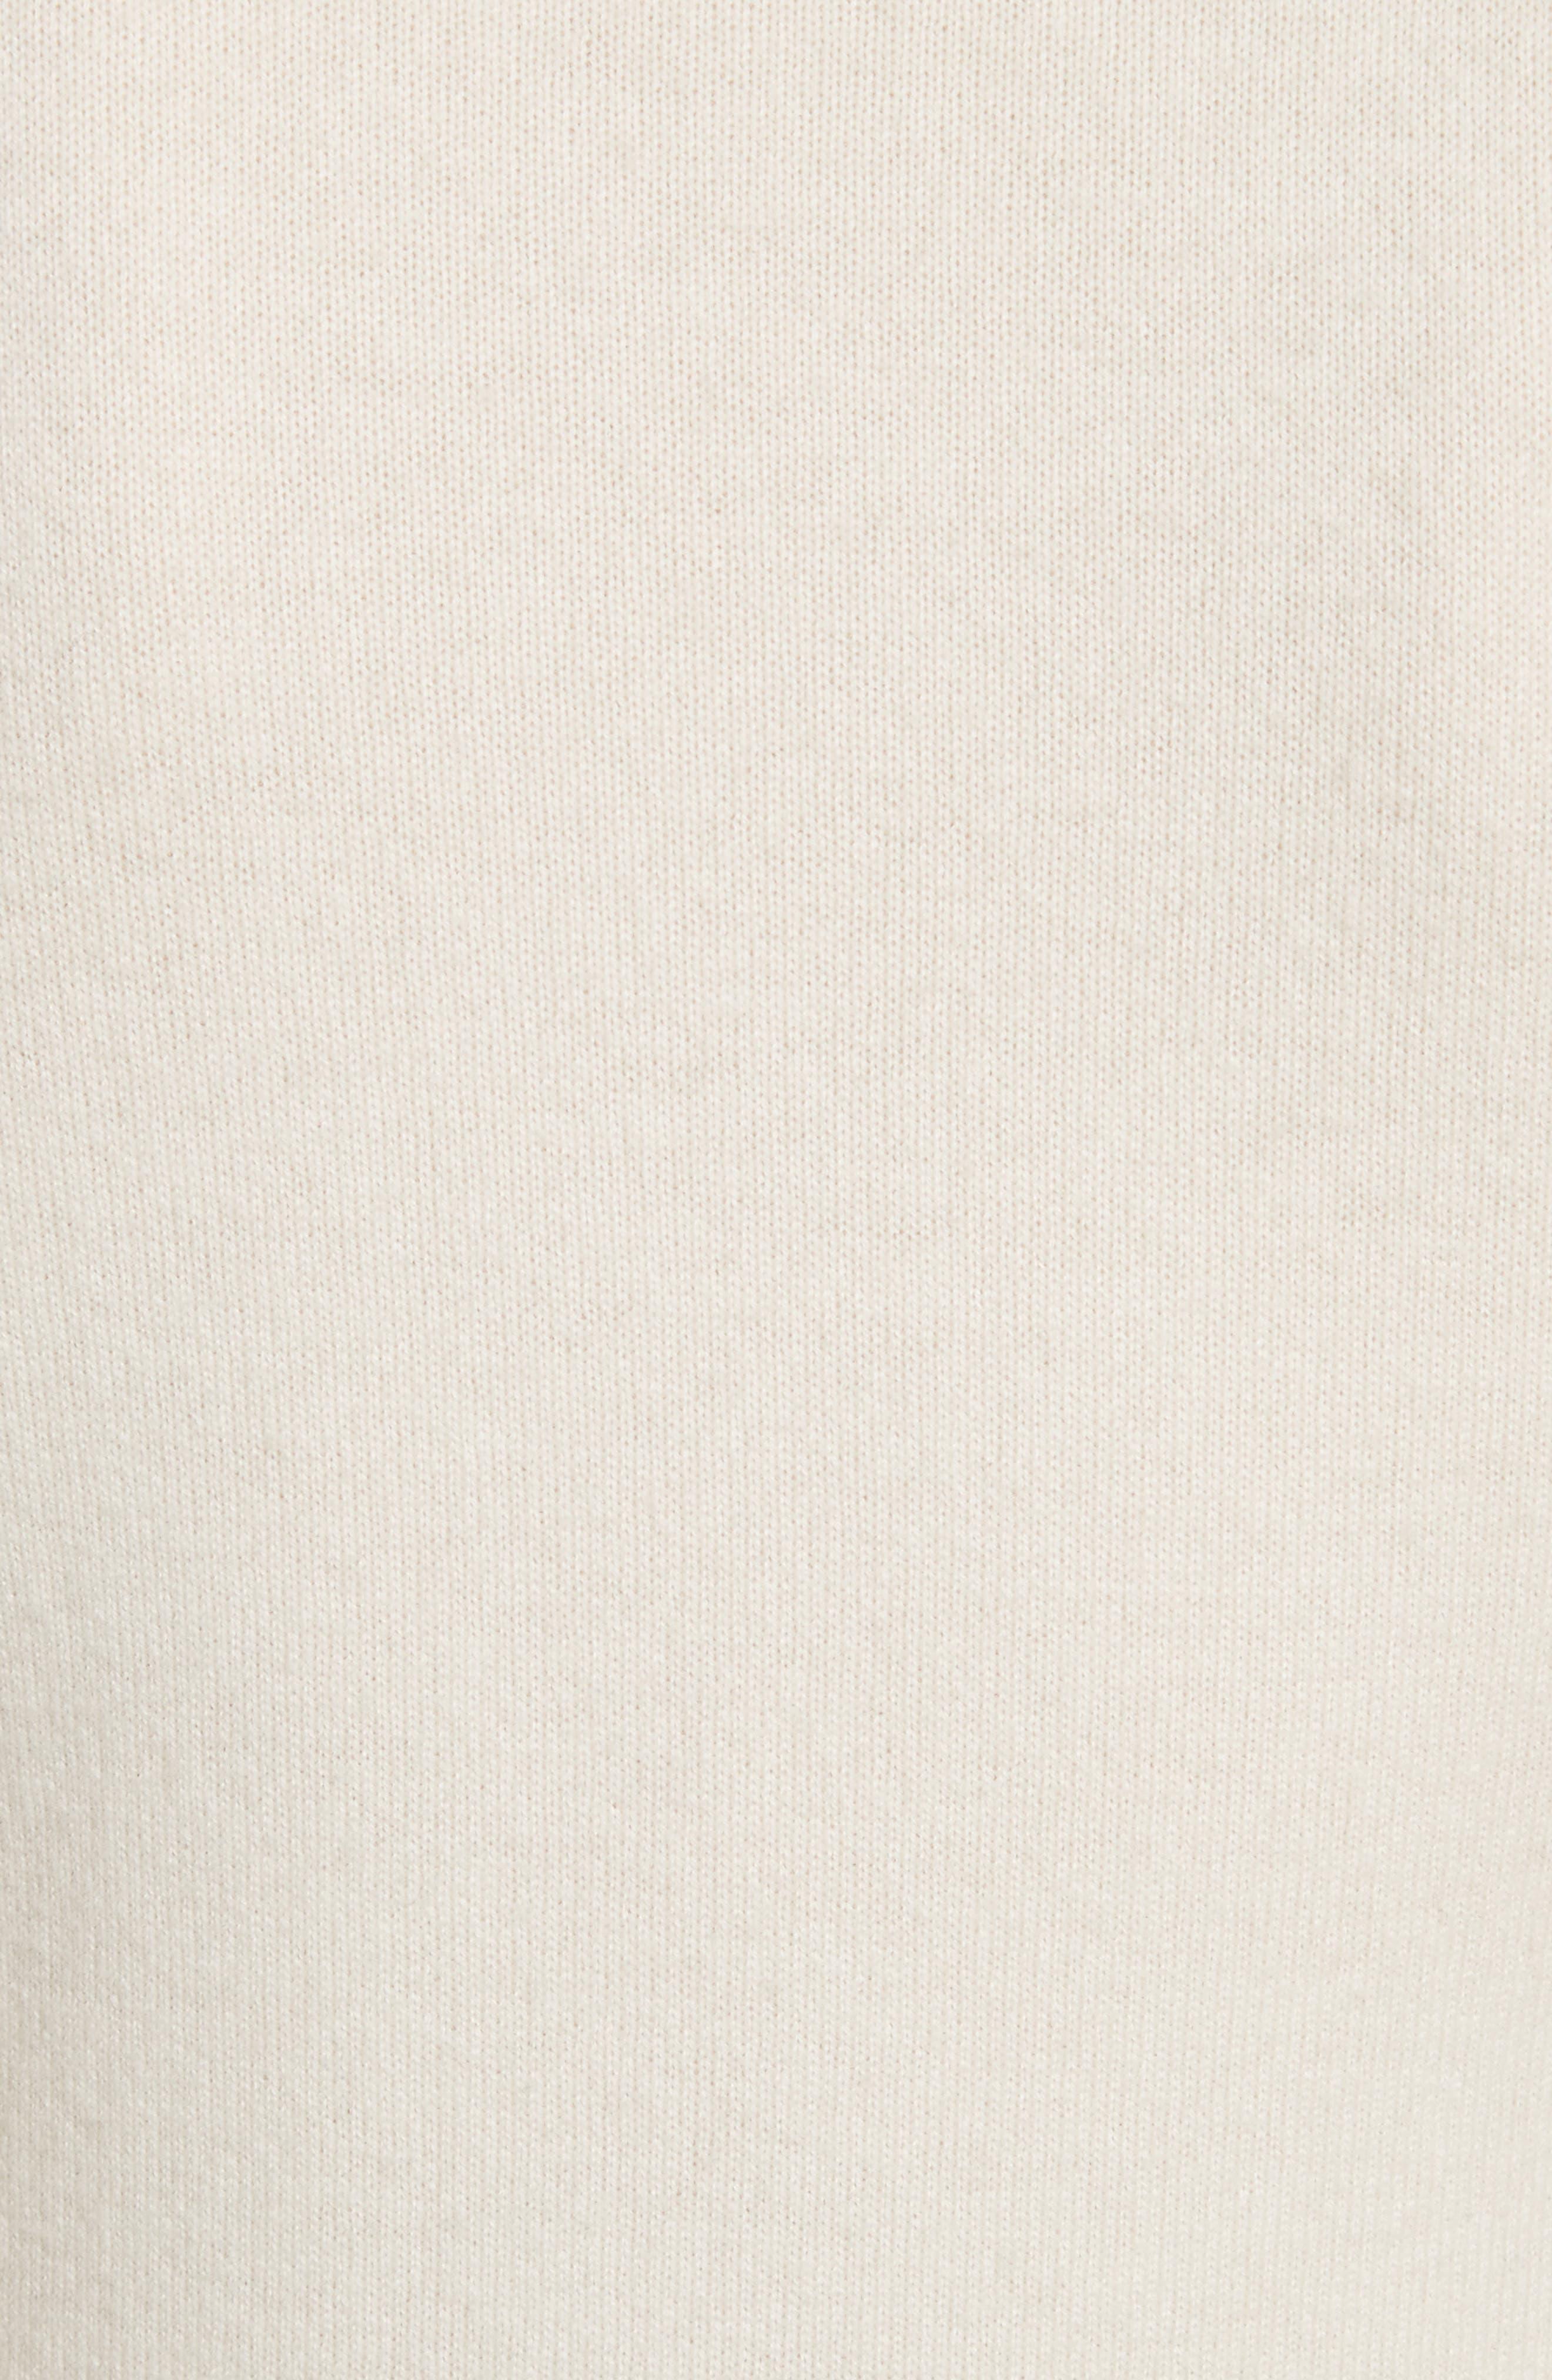 Cashmere Turtleneck Shell,                             Alternate thumbnail 5, color,                             907